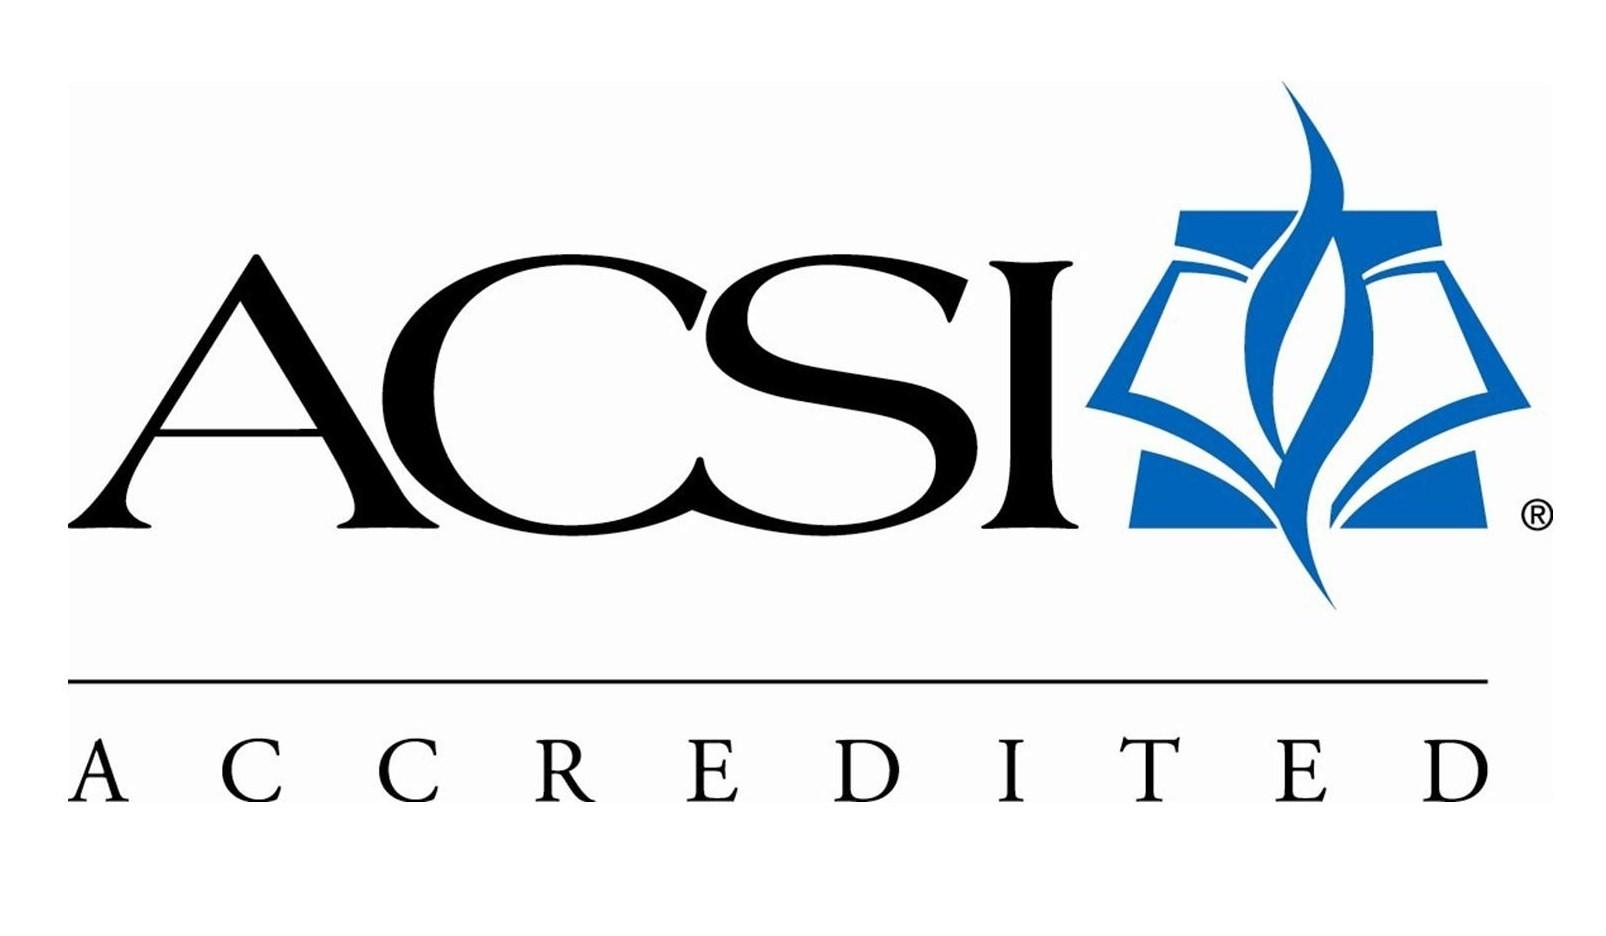 ACSI imagen